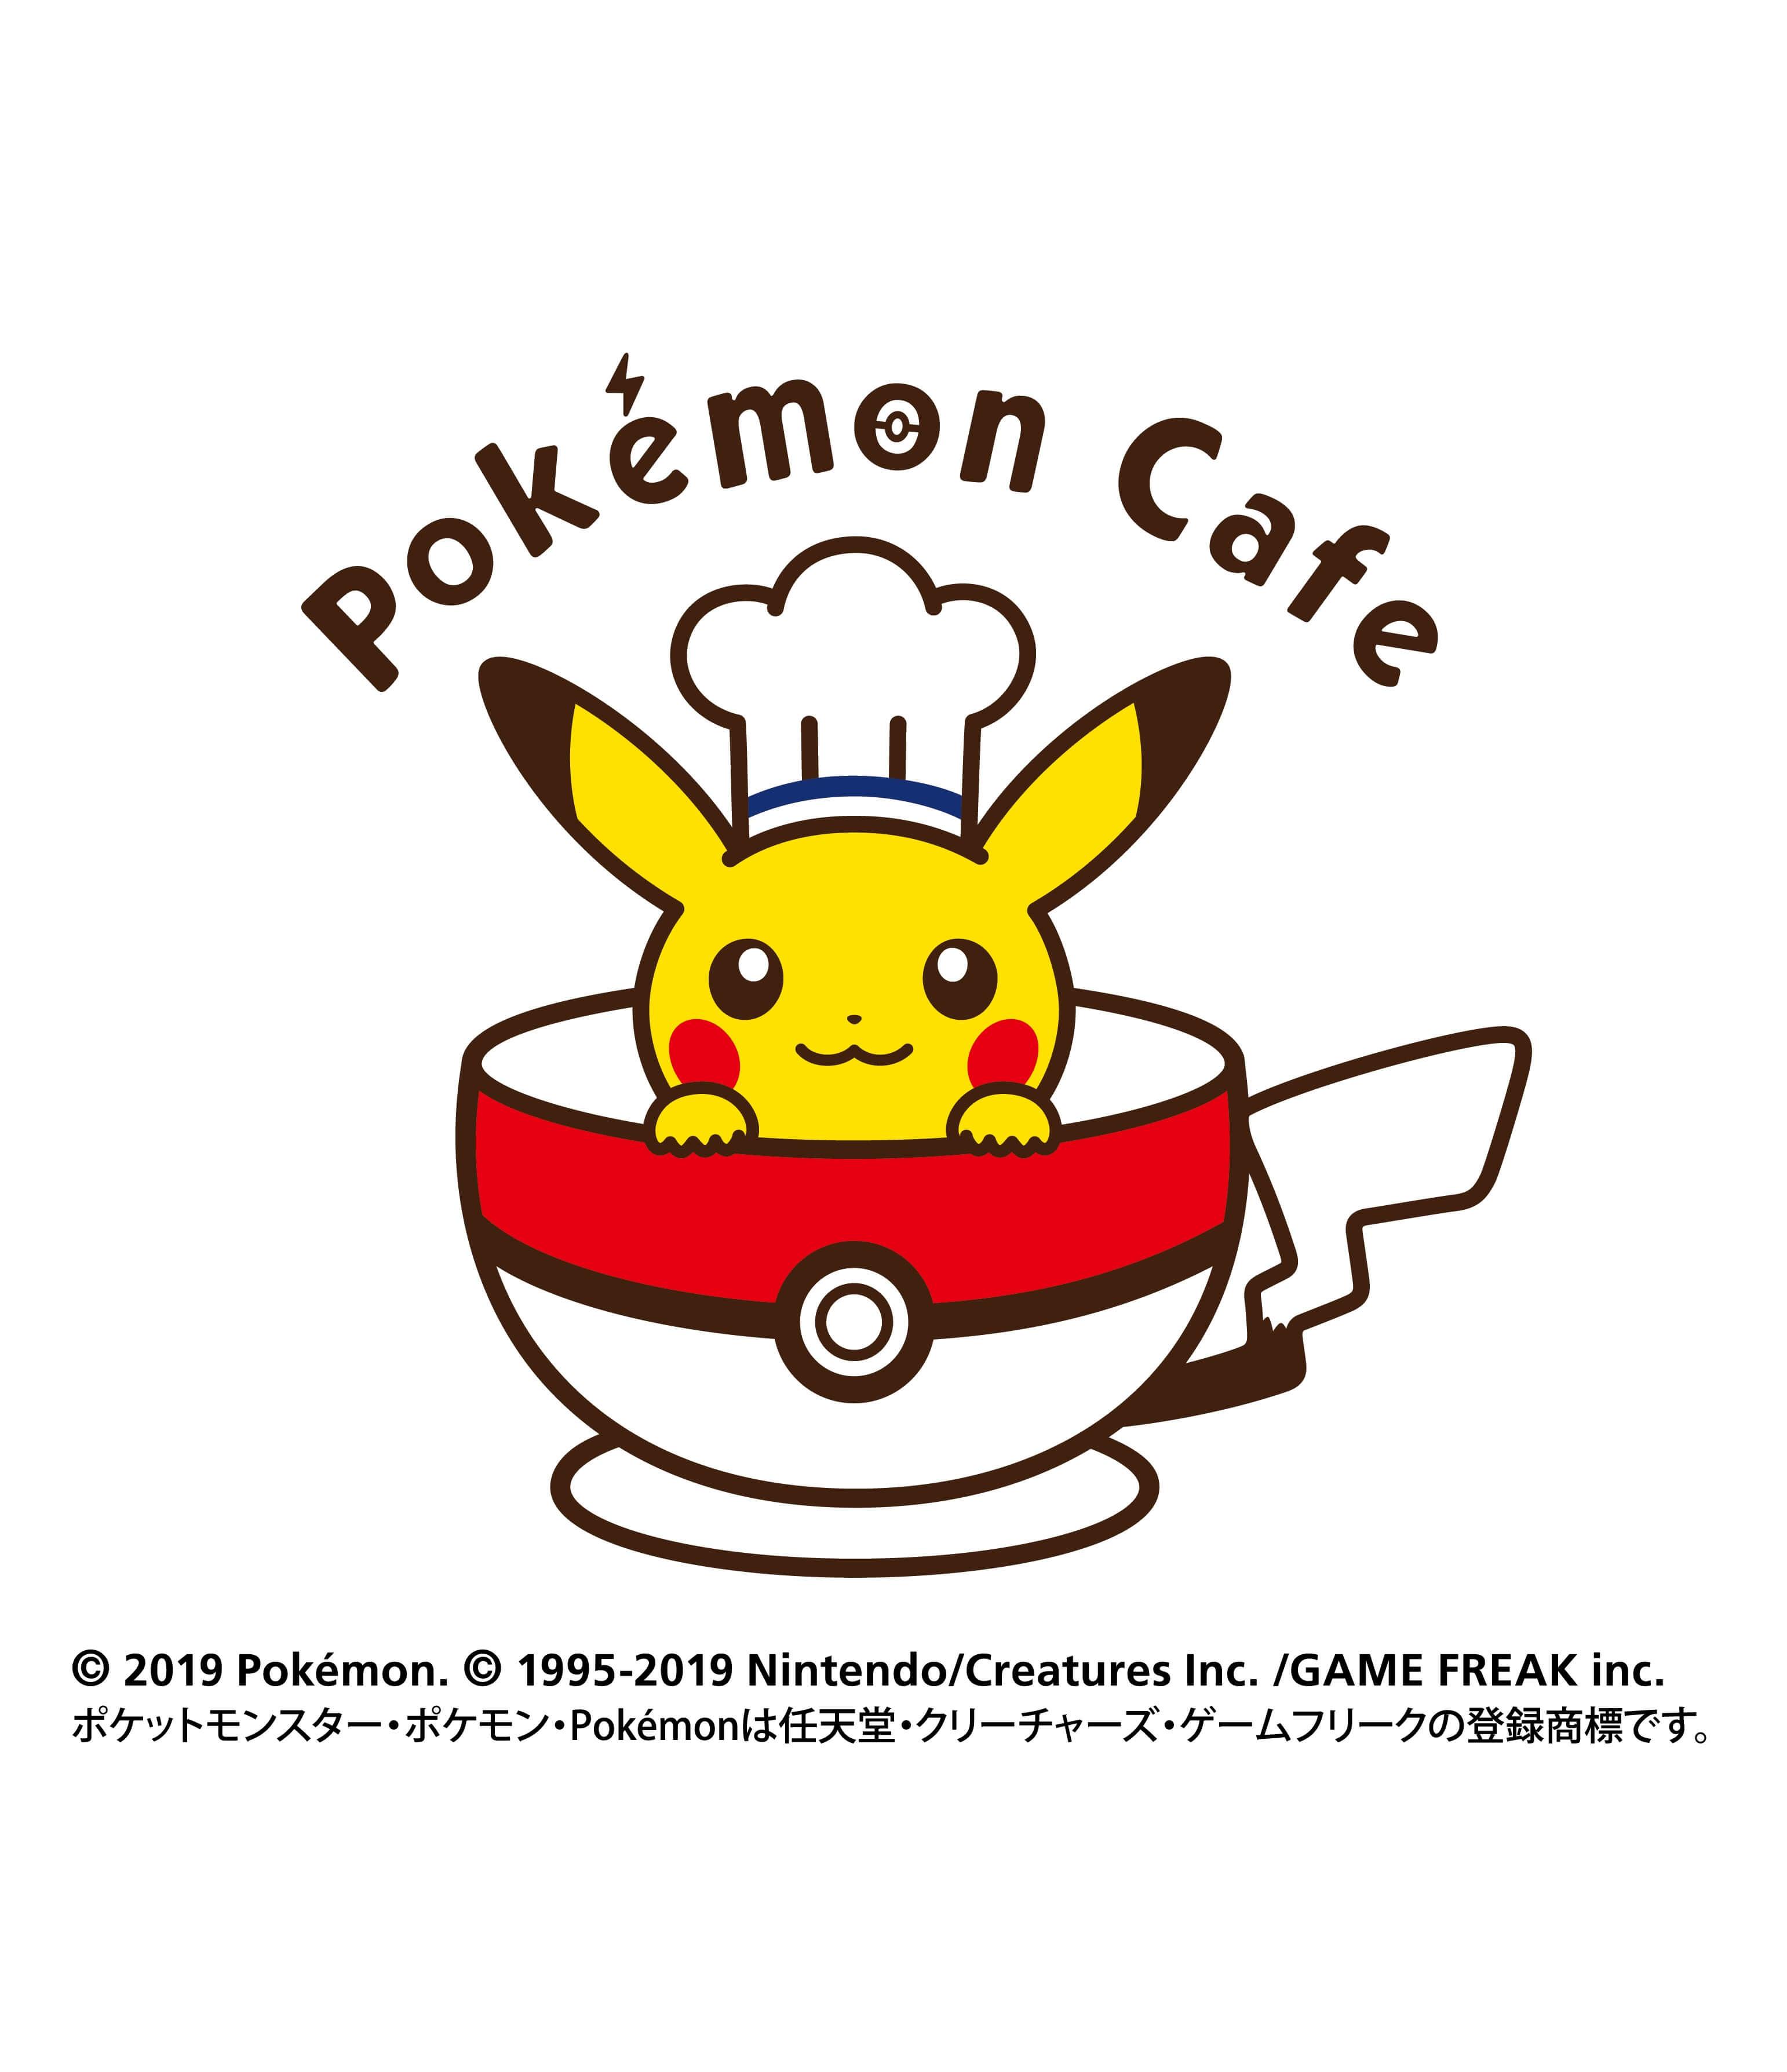 Pokémon cafe celebrates release of new Pokémon movie